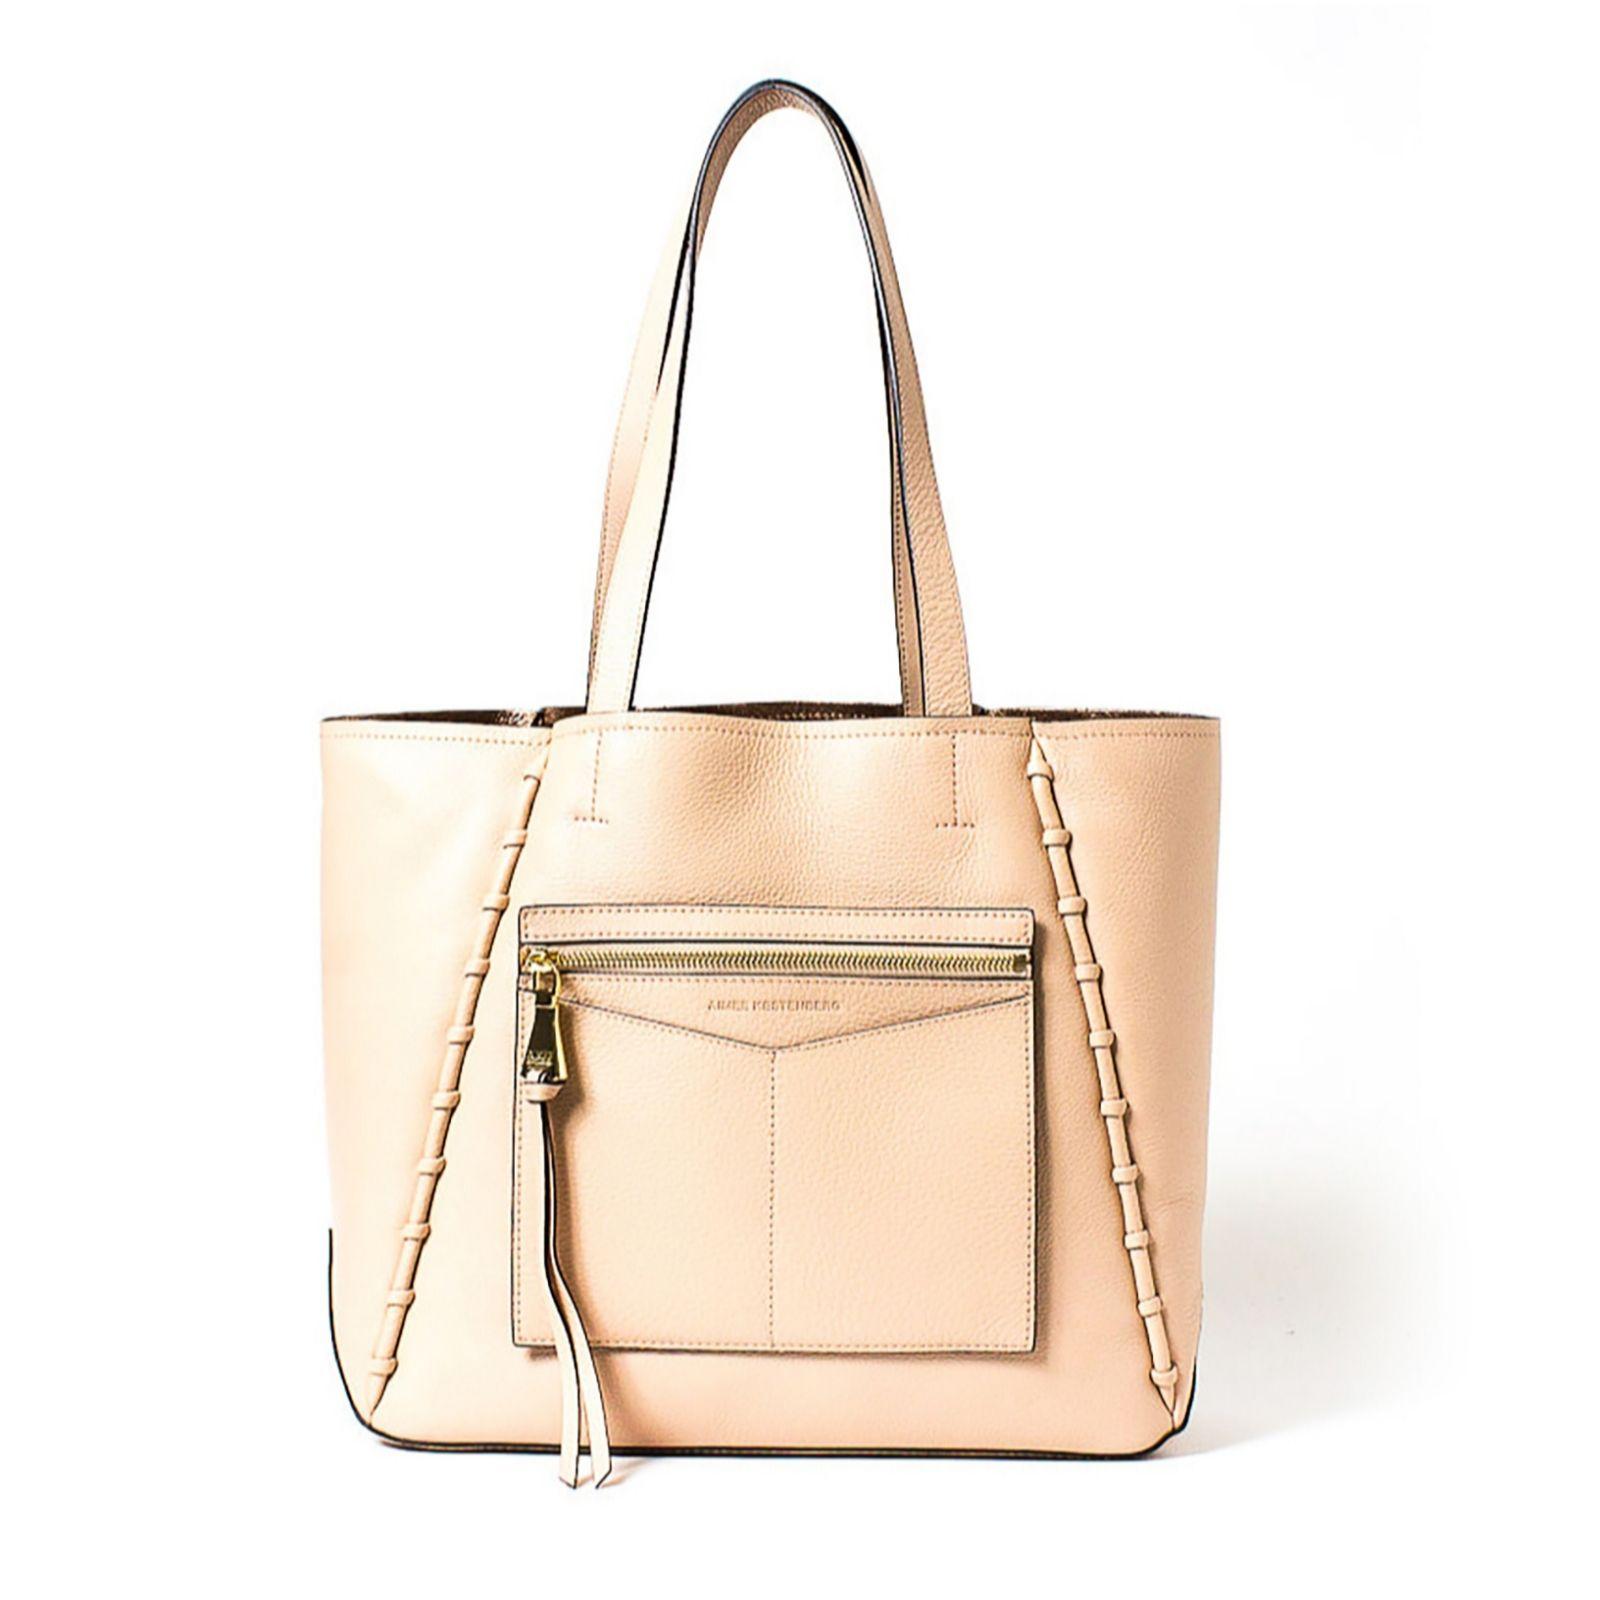 1b72f3f185 Aimee Kestenberg Delara Large Leather Double Sided Tote Bag ...